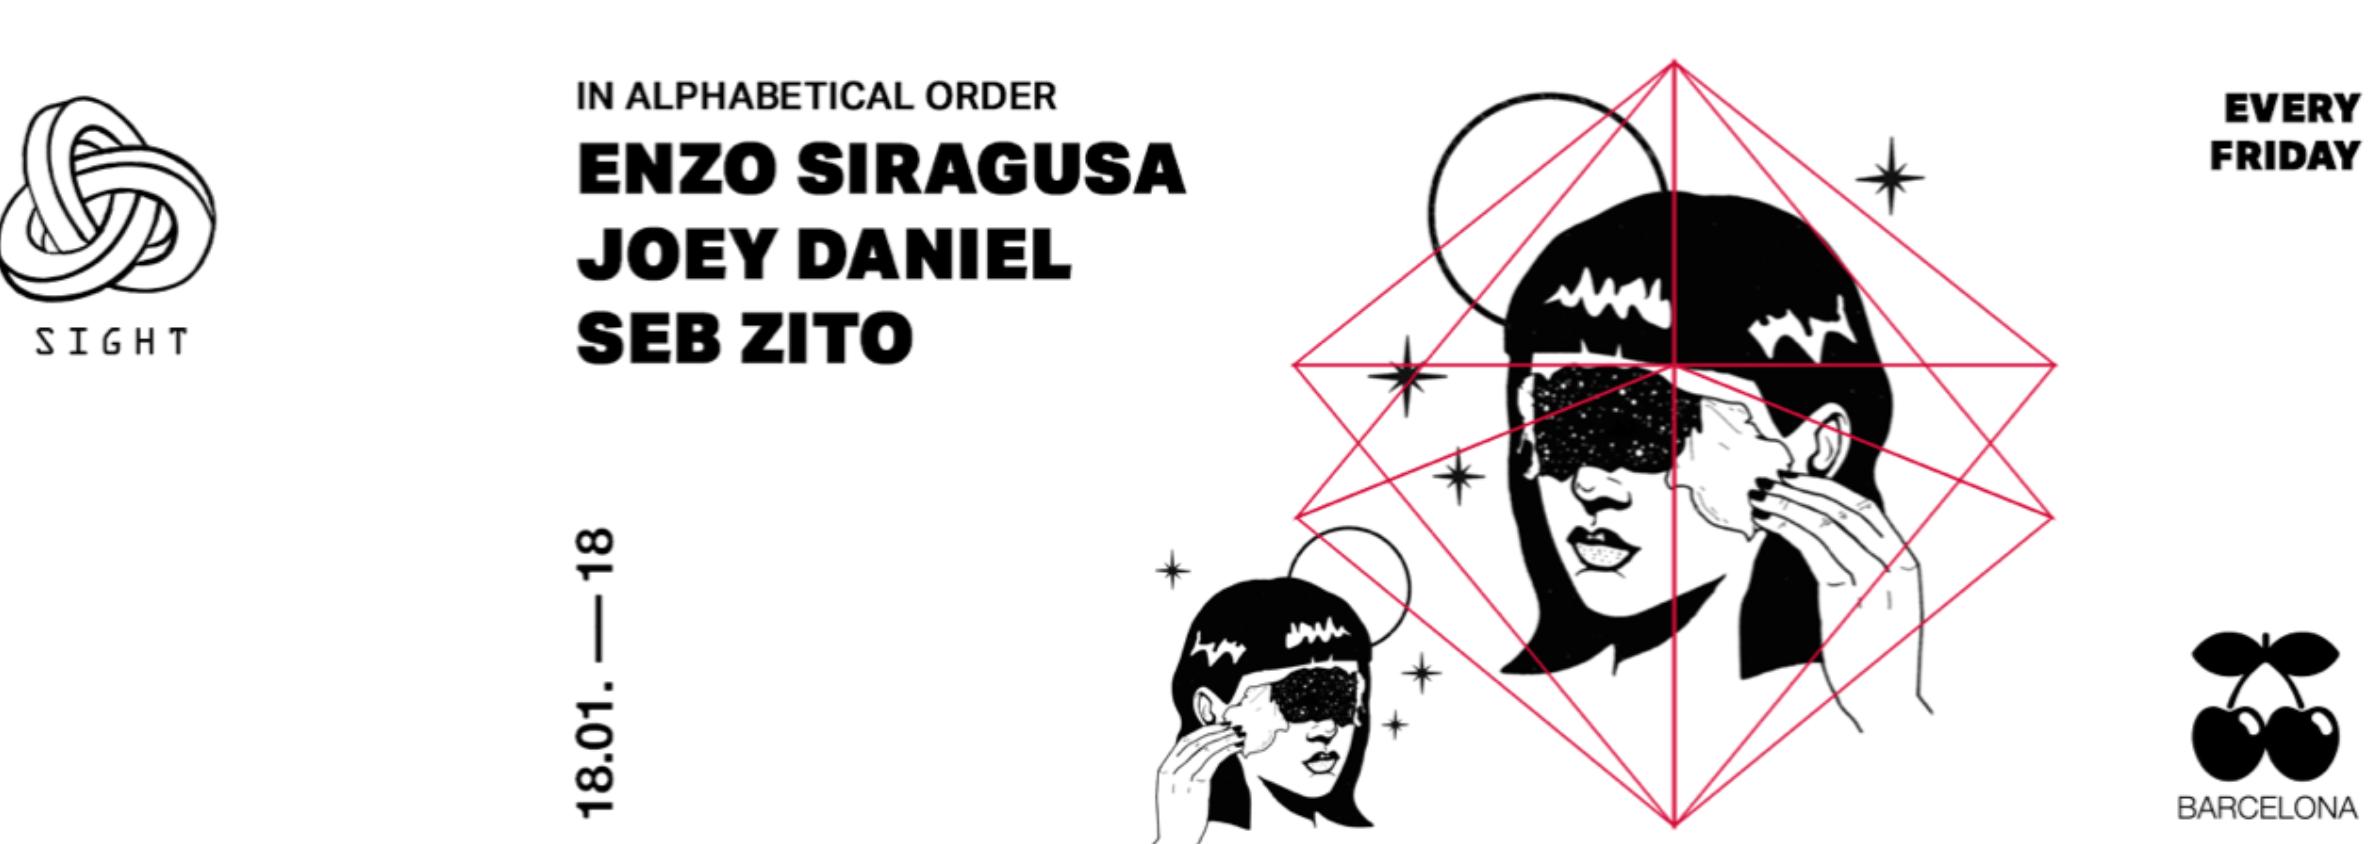 SIGHT PRES. ENZO SIRAGUSA, JOEY DANIEL AND SEB ZITO PACHA BARCELONA